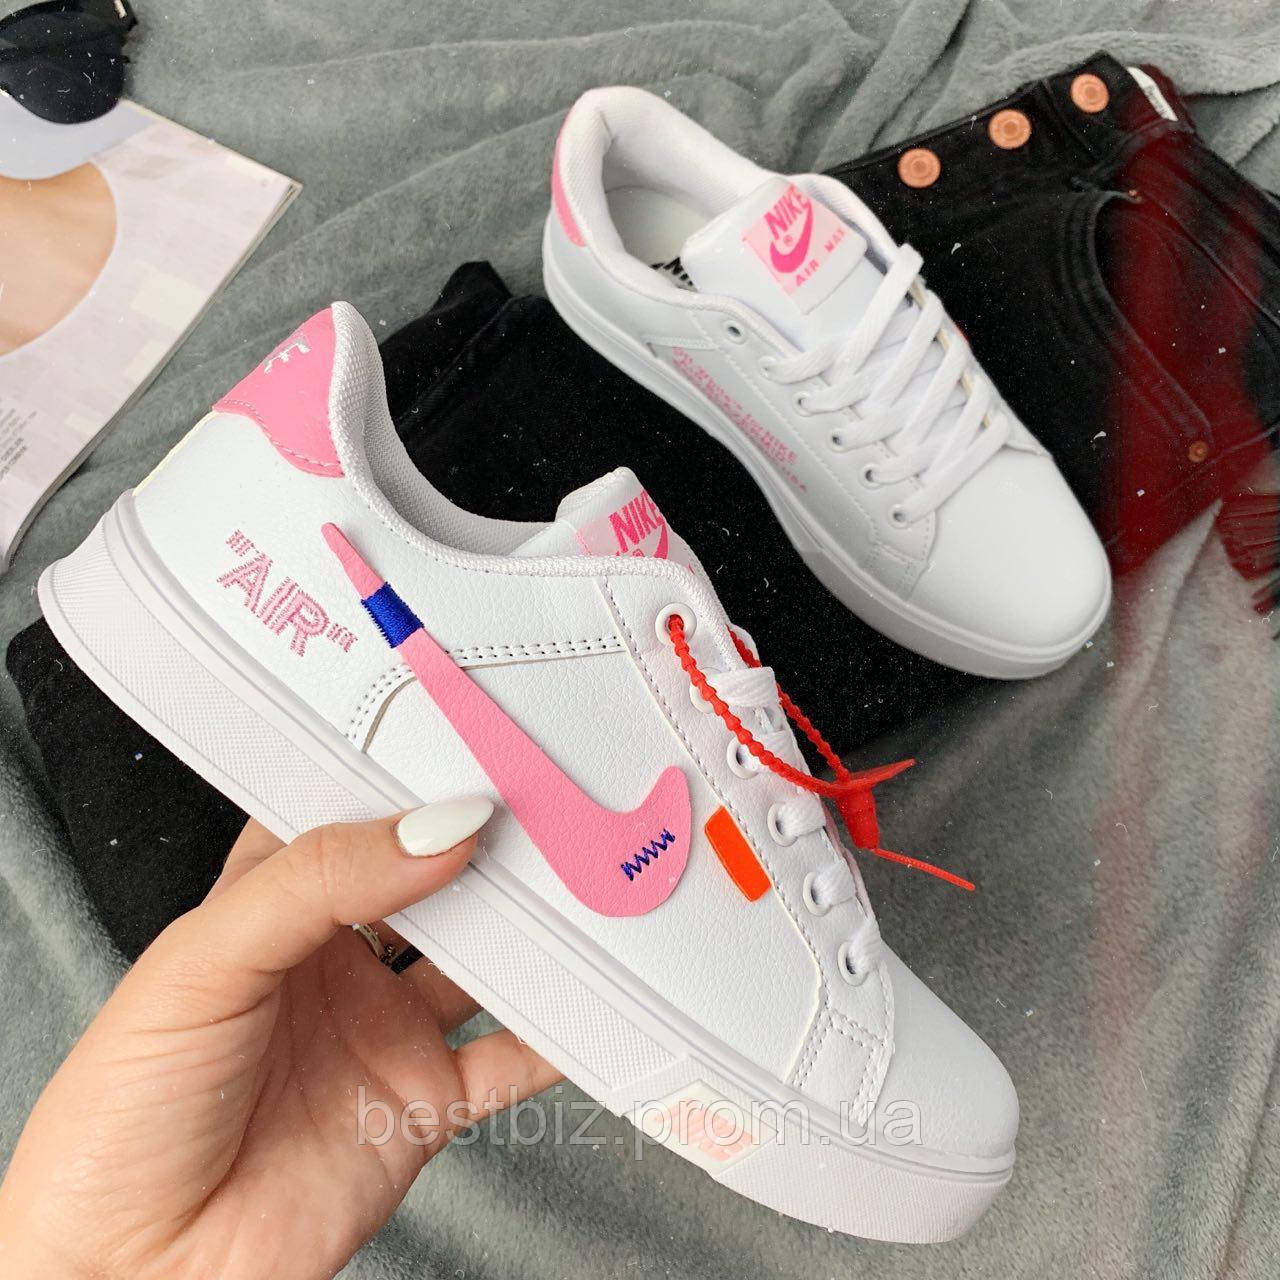 Кроссовки  Nike Air x OFF-White 00061 [ 36,37,38,39,40 ]